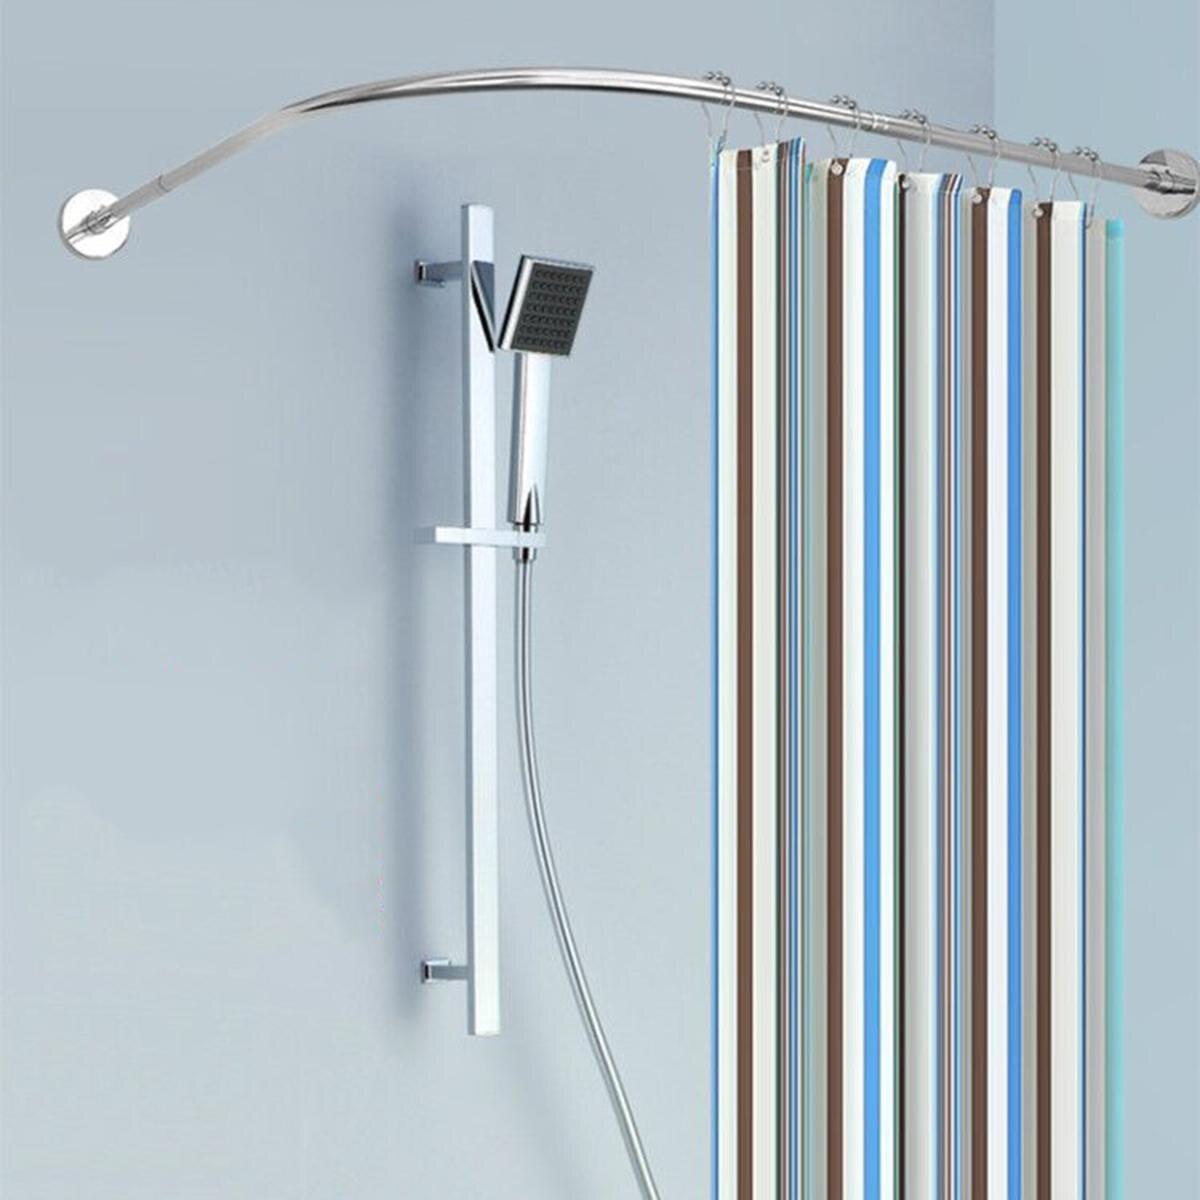 12 pcs steel shower curtain rail 40 64inch corner rail rod bath tub pole track rod brush stainless steel shower curtain rod